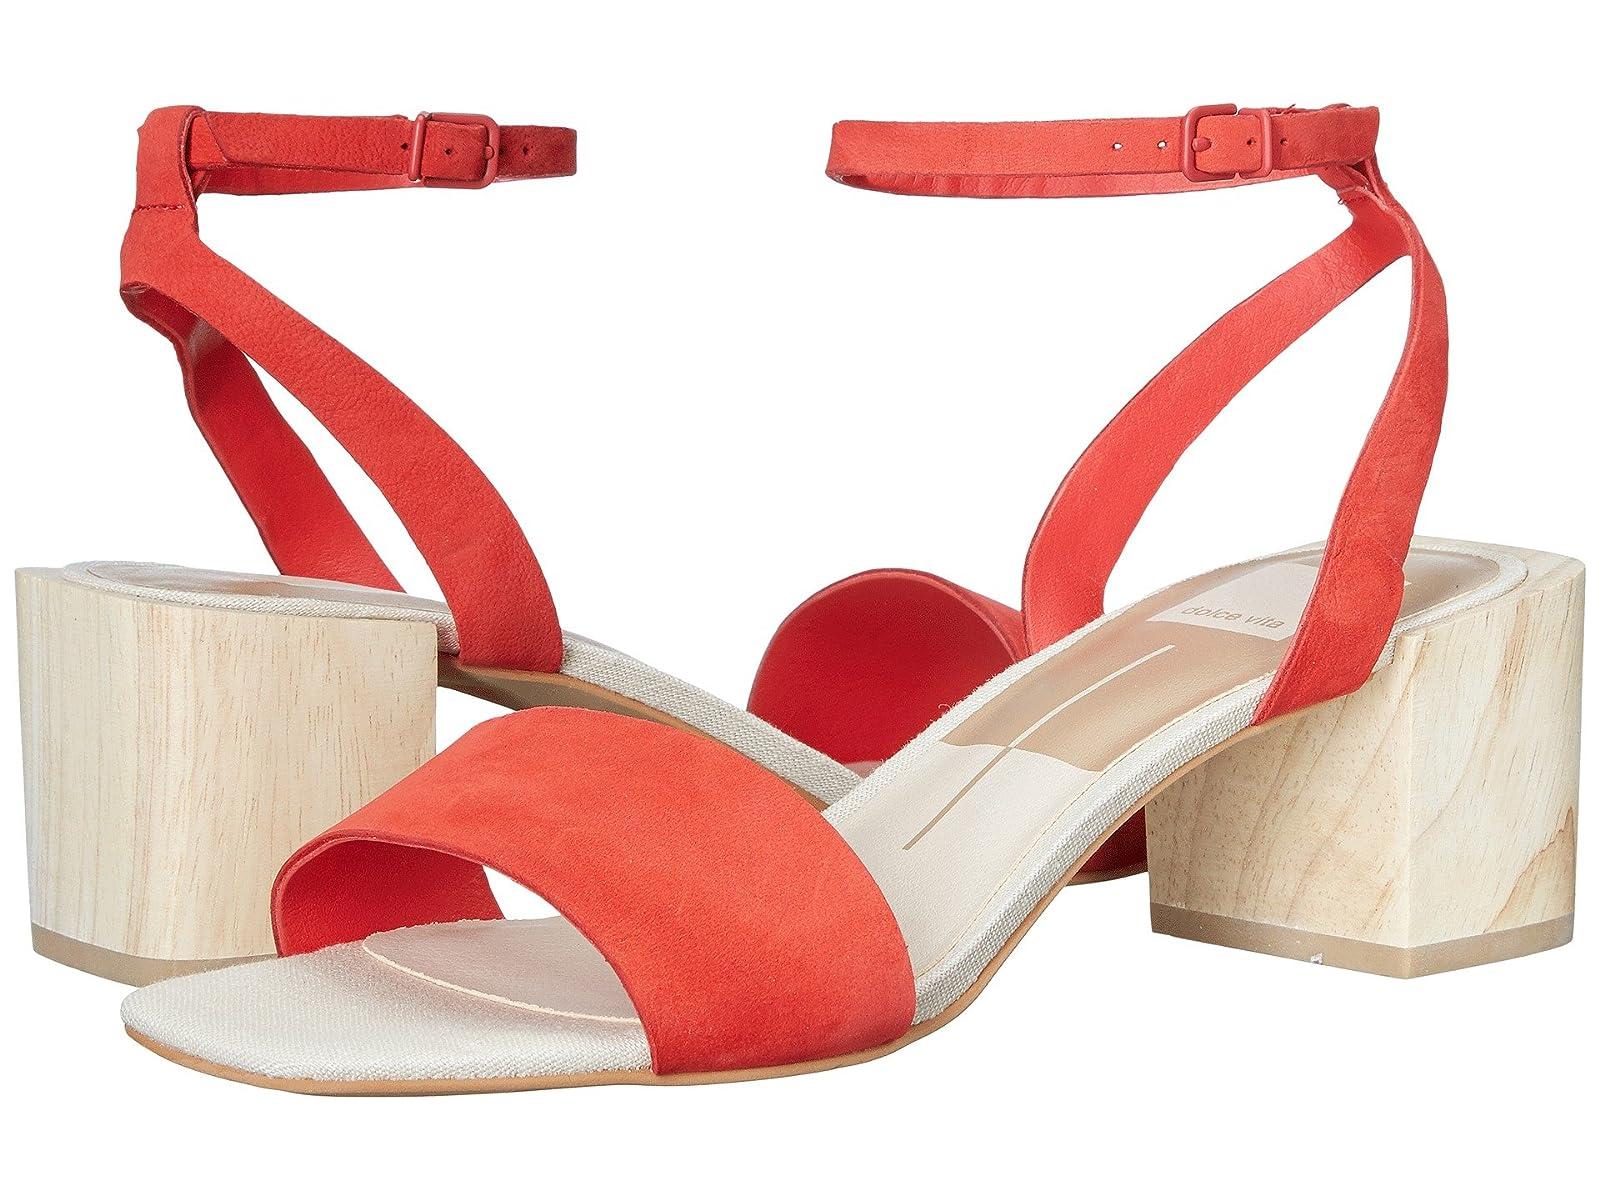 Dolce Vita ZaritaCheap and distinctive eye-catching shoes